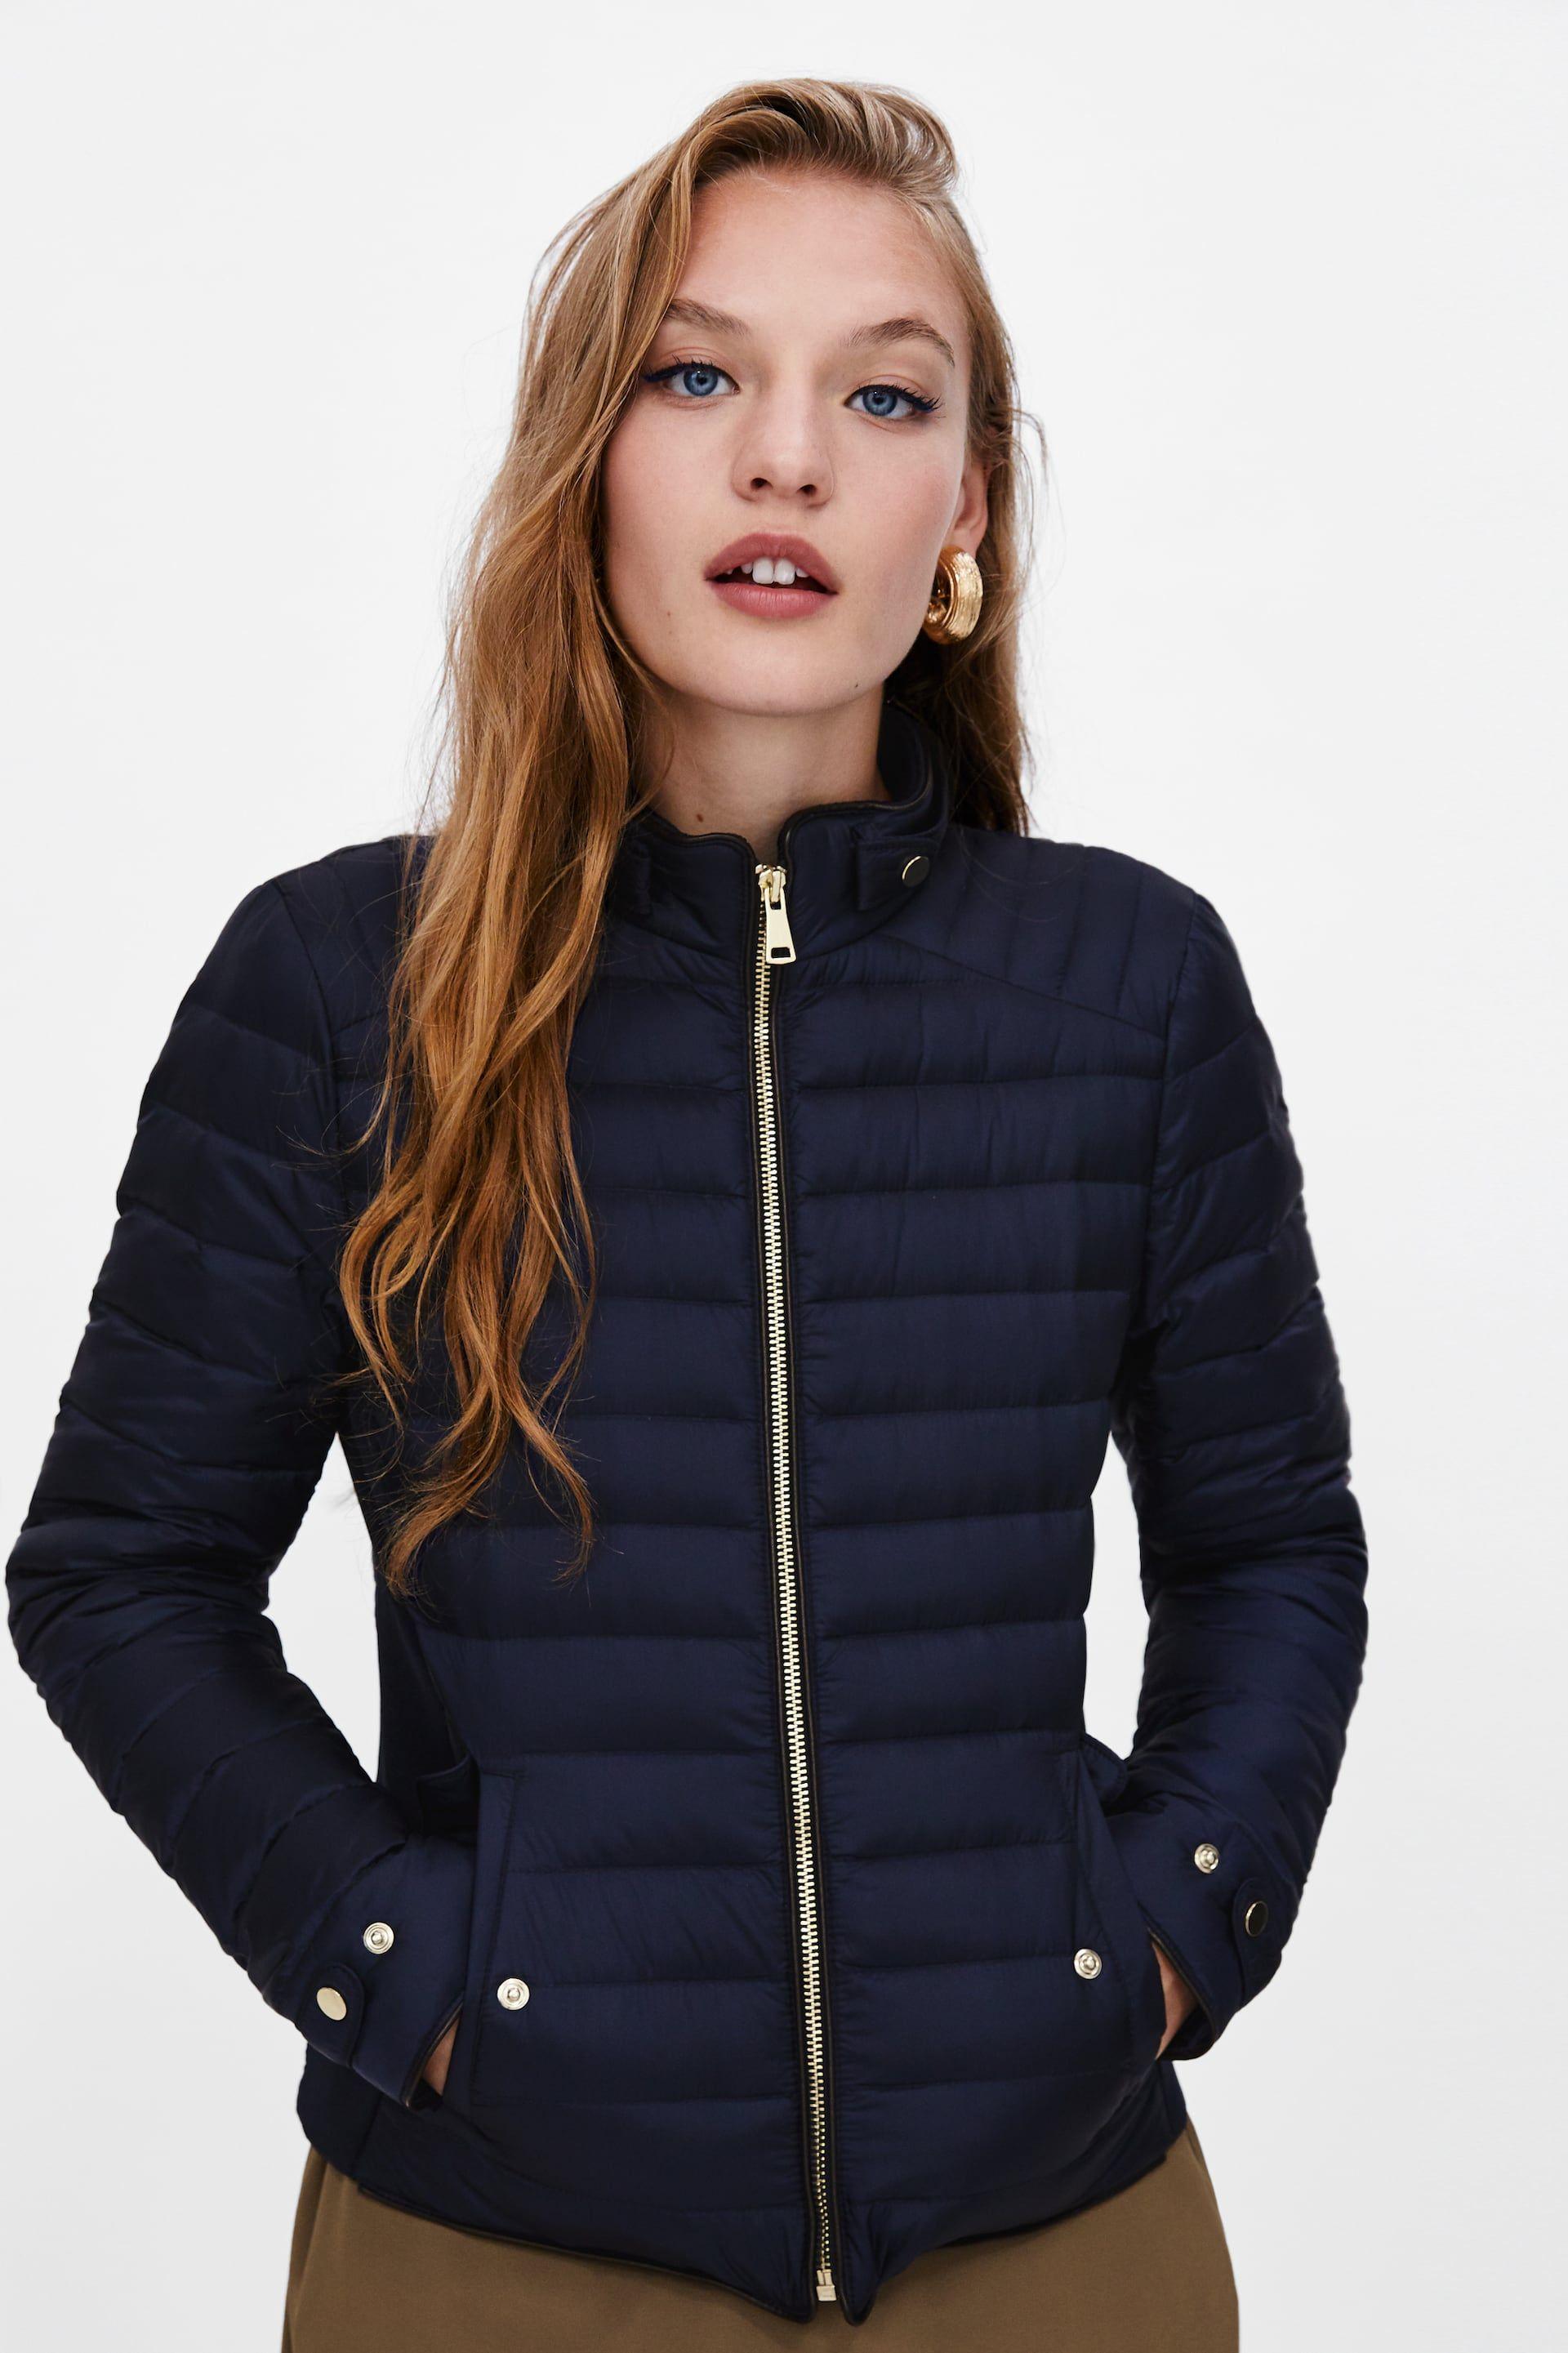 Lightweight Down Jacket Puffer Jacket Women Jackets For Women Winter Fashion Outfits